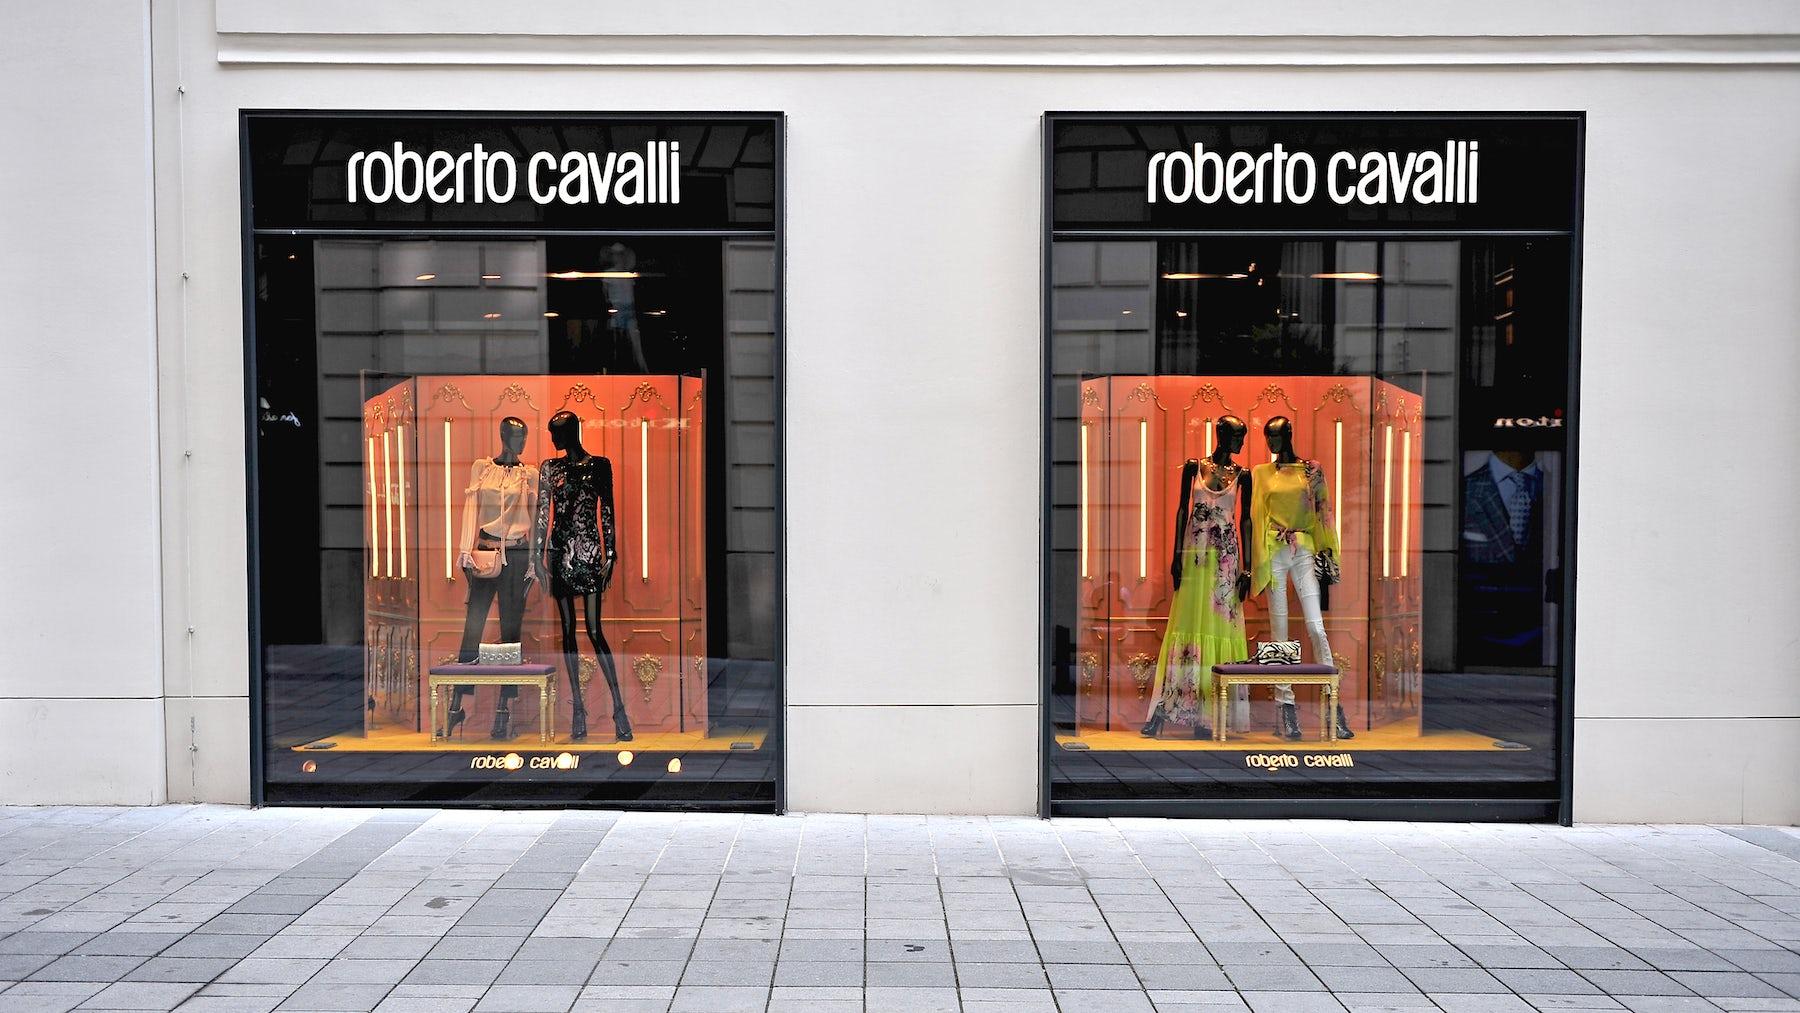 Roberto Cavalli Store | Source: Shutterstock